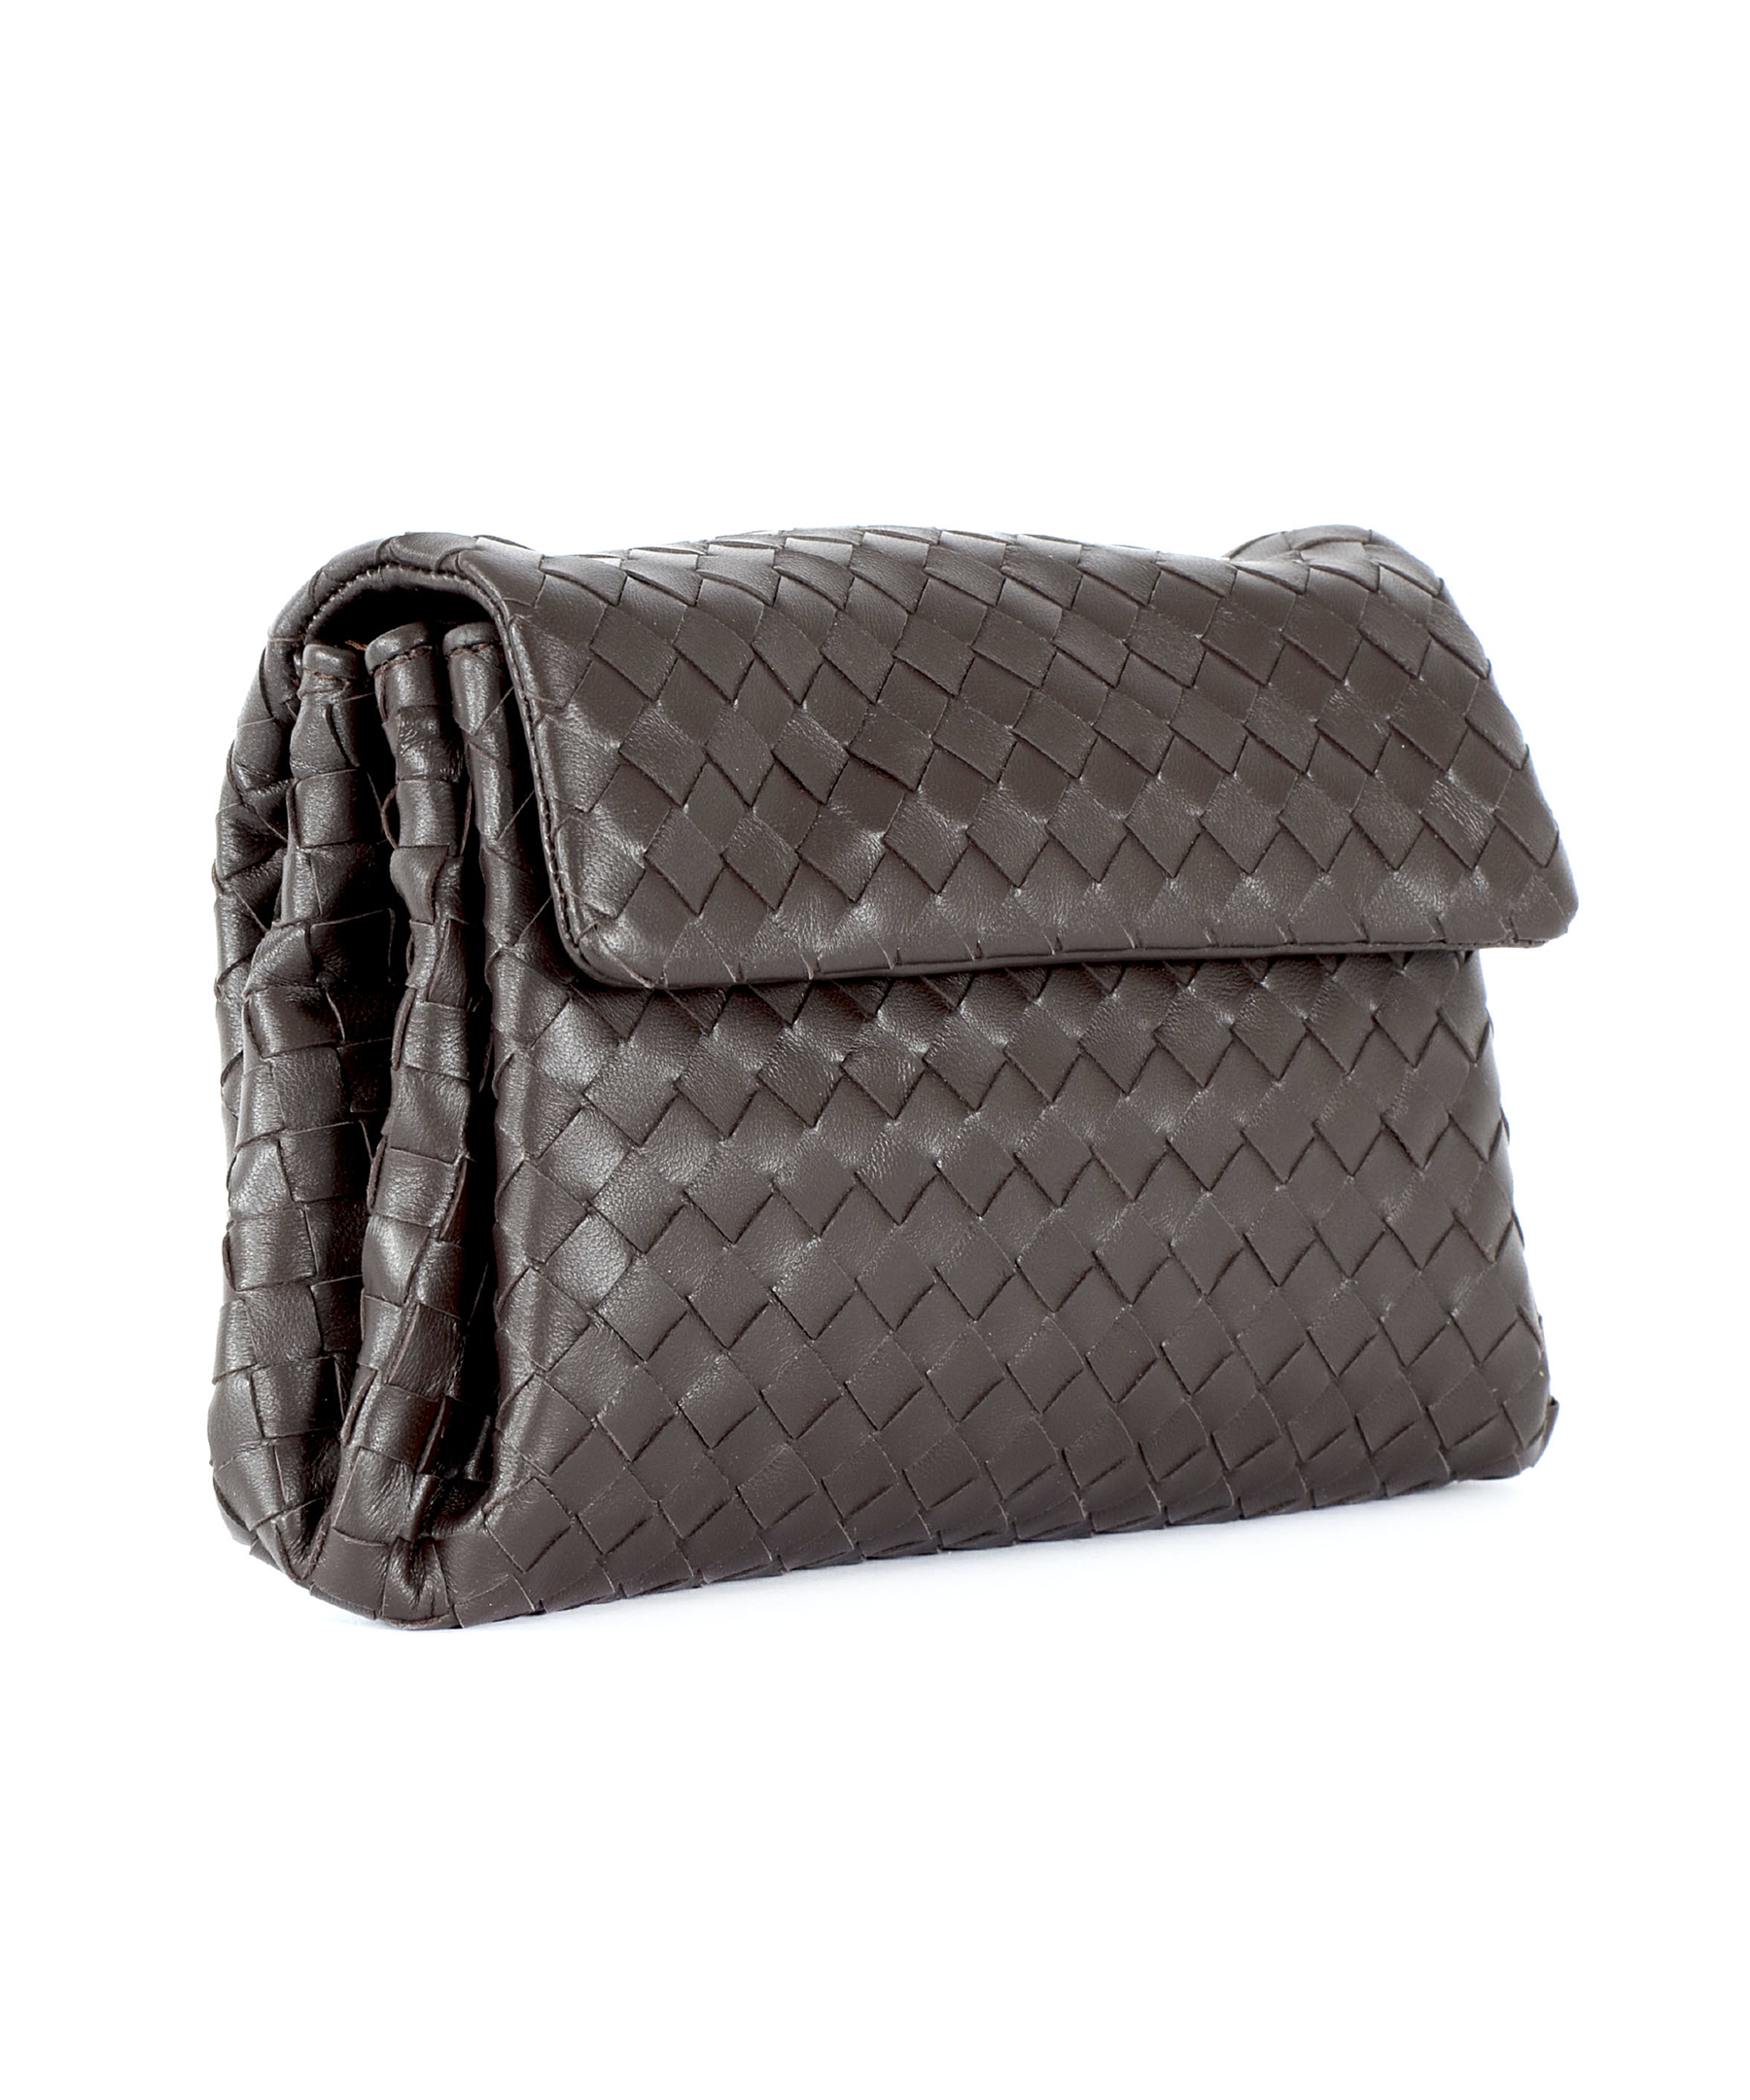 bottega veneta clutch in brown lyst. Black Bedroom Furniture Sets. Home Design Ideas